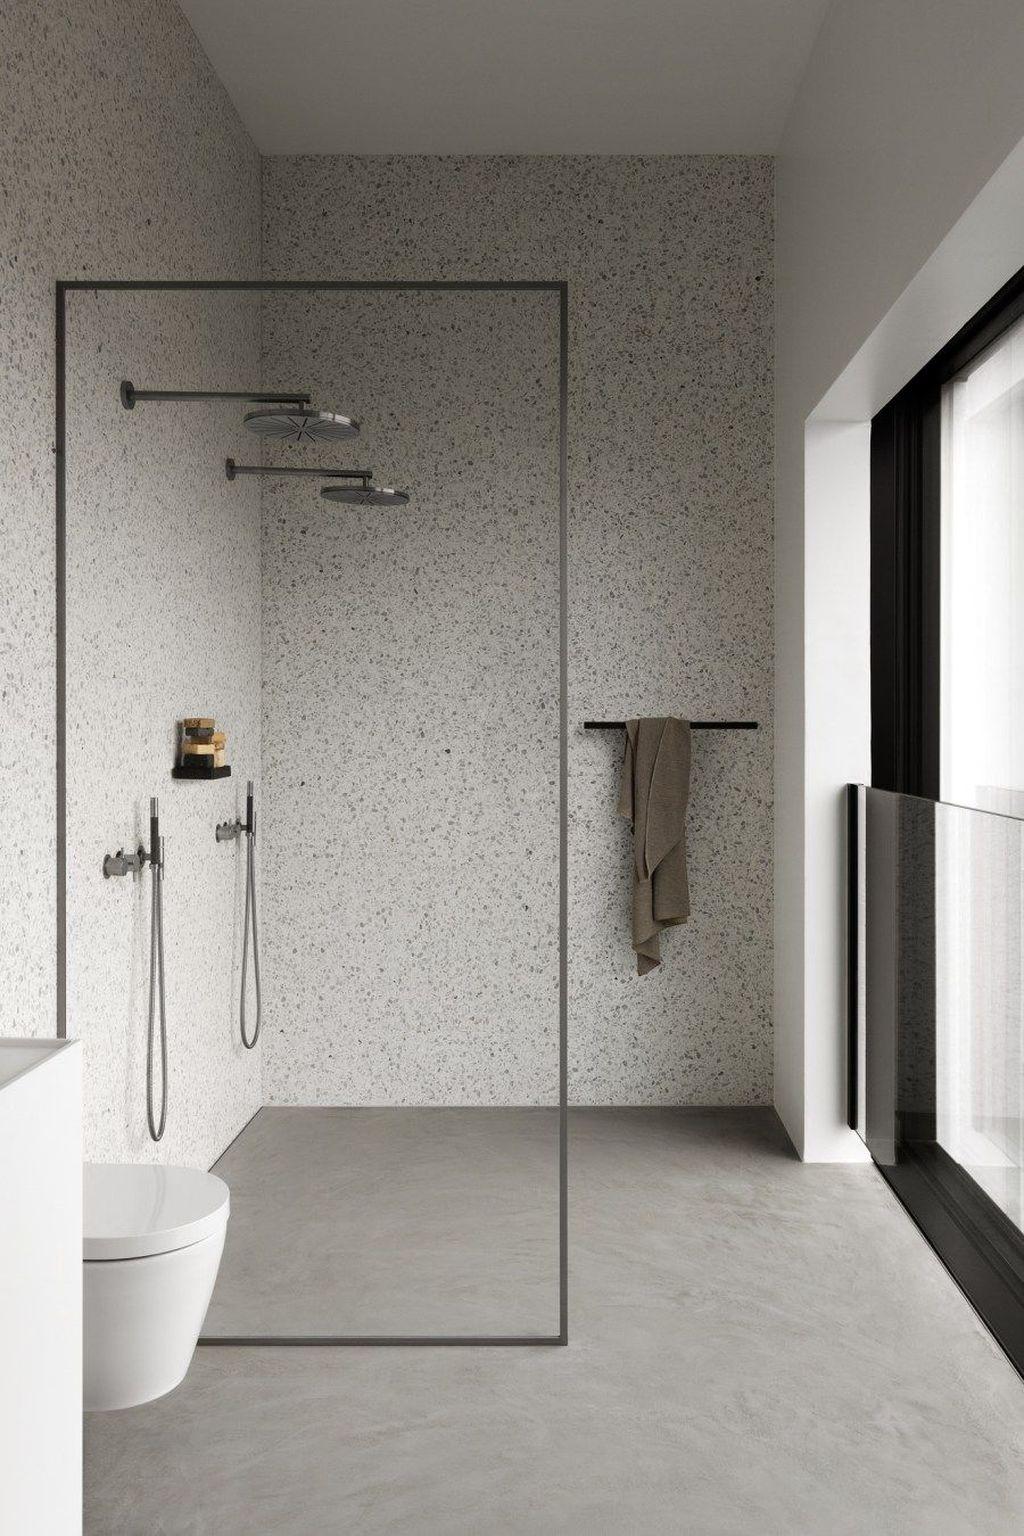 Fabulous Minimalist Bathroom Decor Ideas That Become Everyones Dream 31